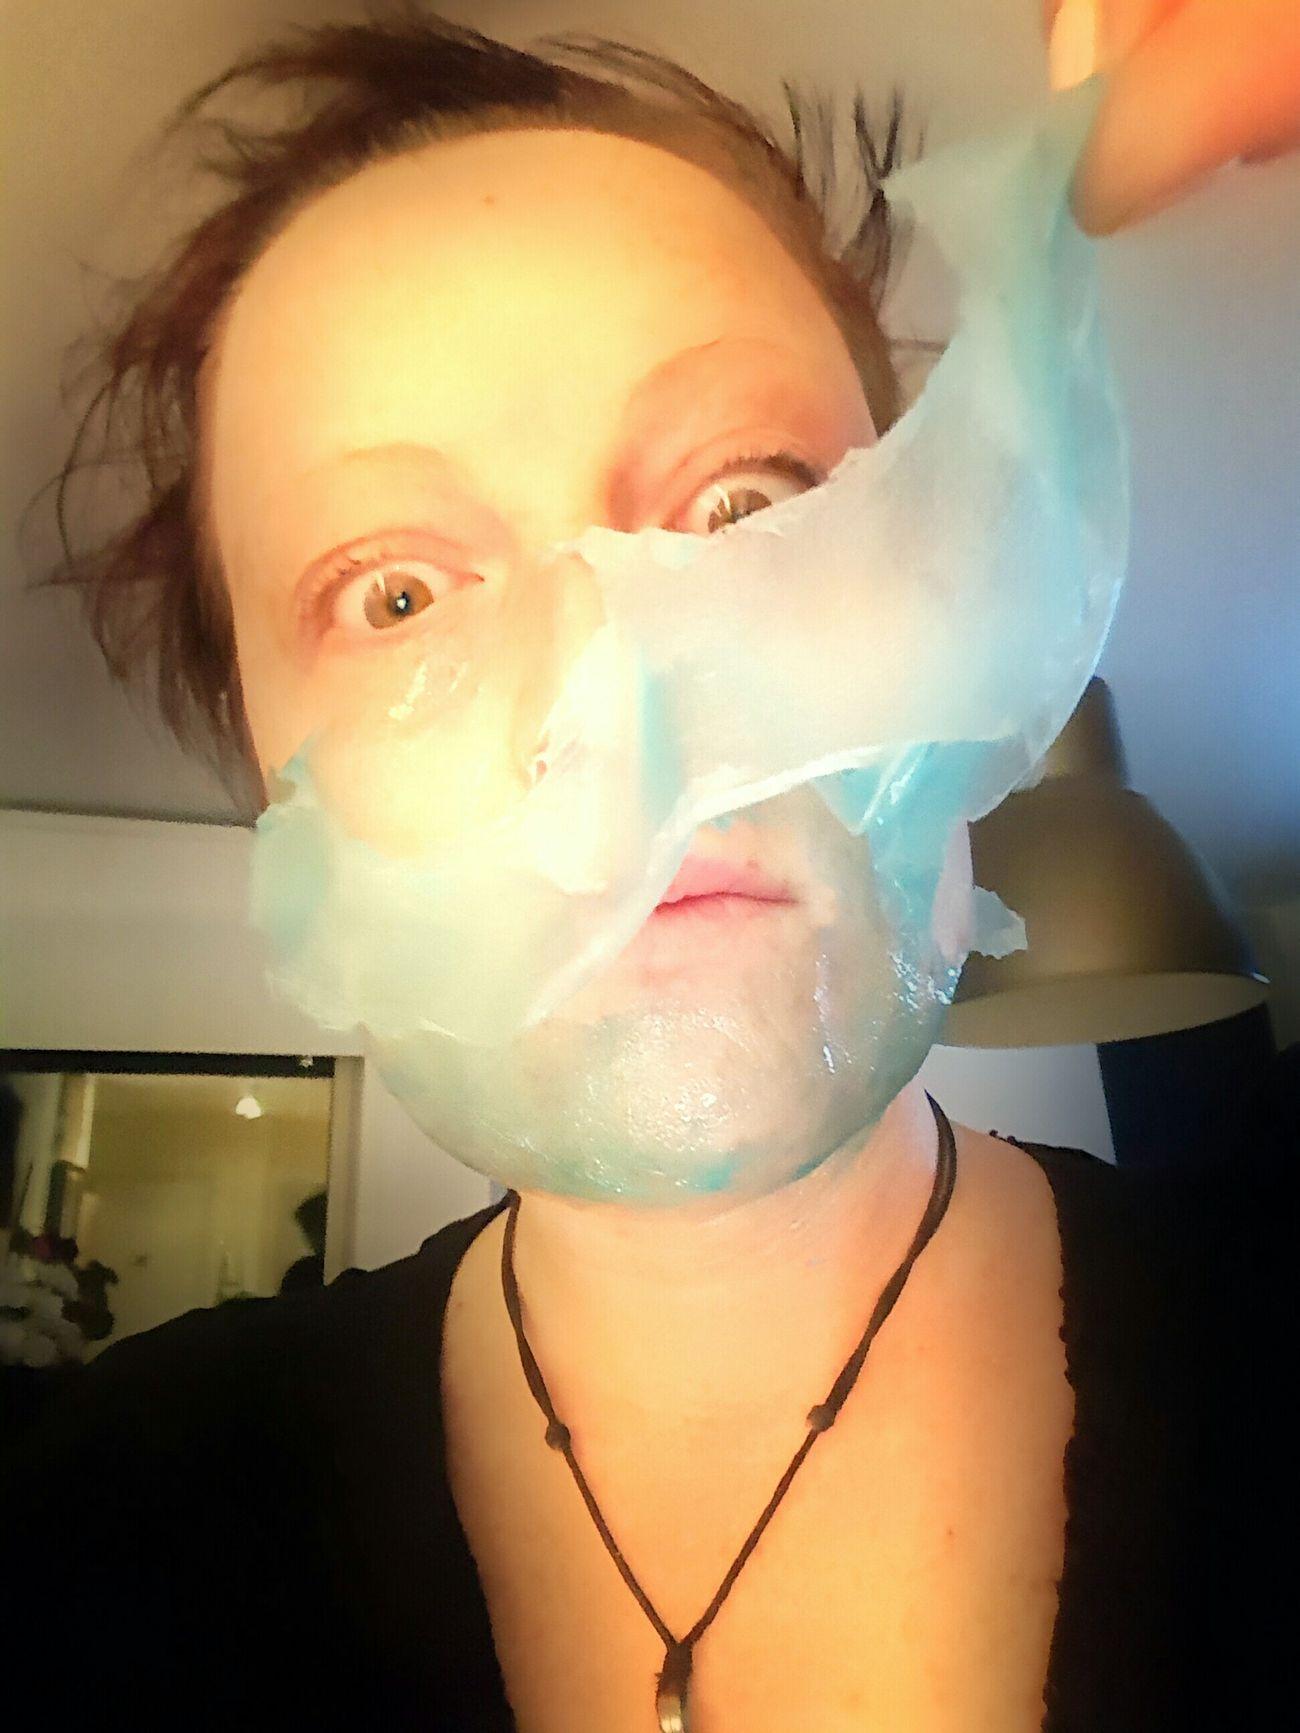 Gesichtsmaske Gespenster Schnappschuss Beauty Crazy Moments